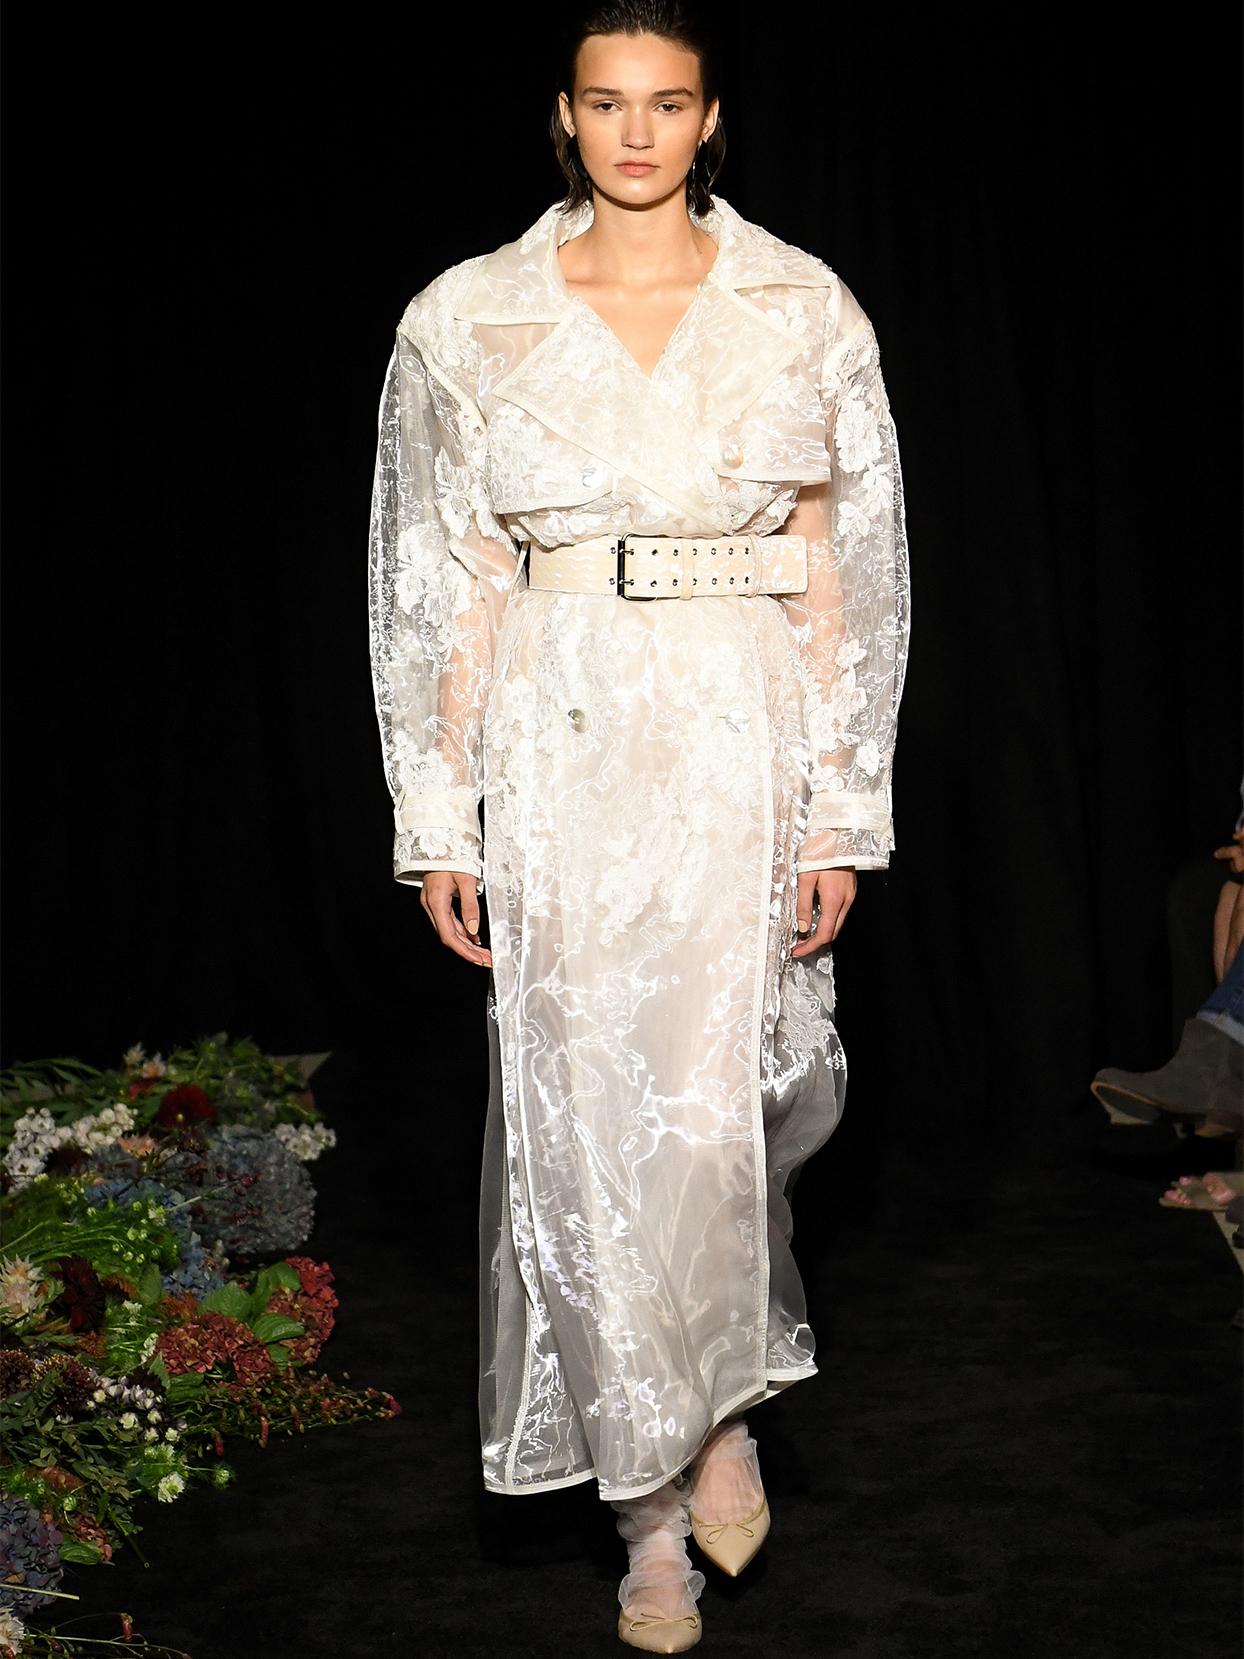 danielle frankel transparent trench coat wedding dress fall 2020